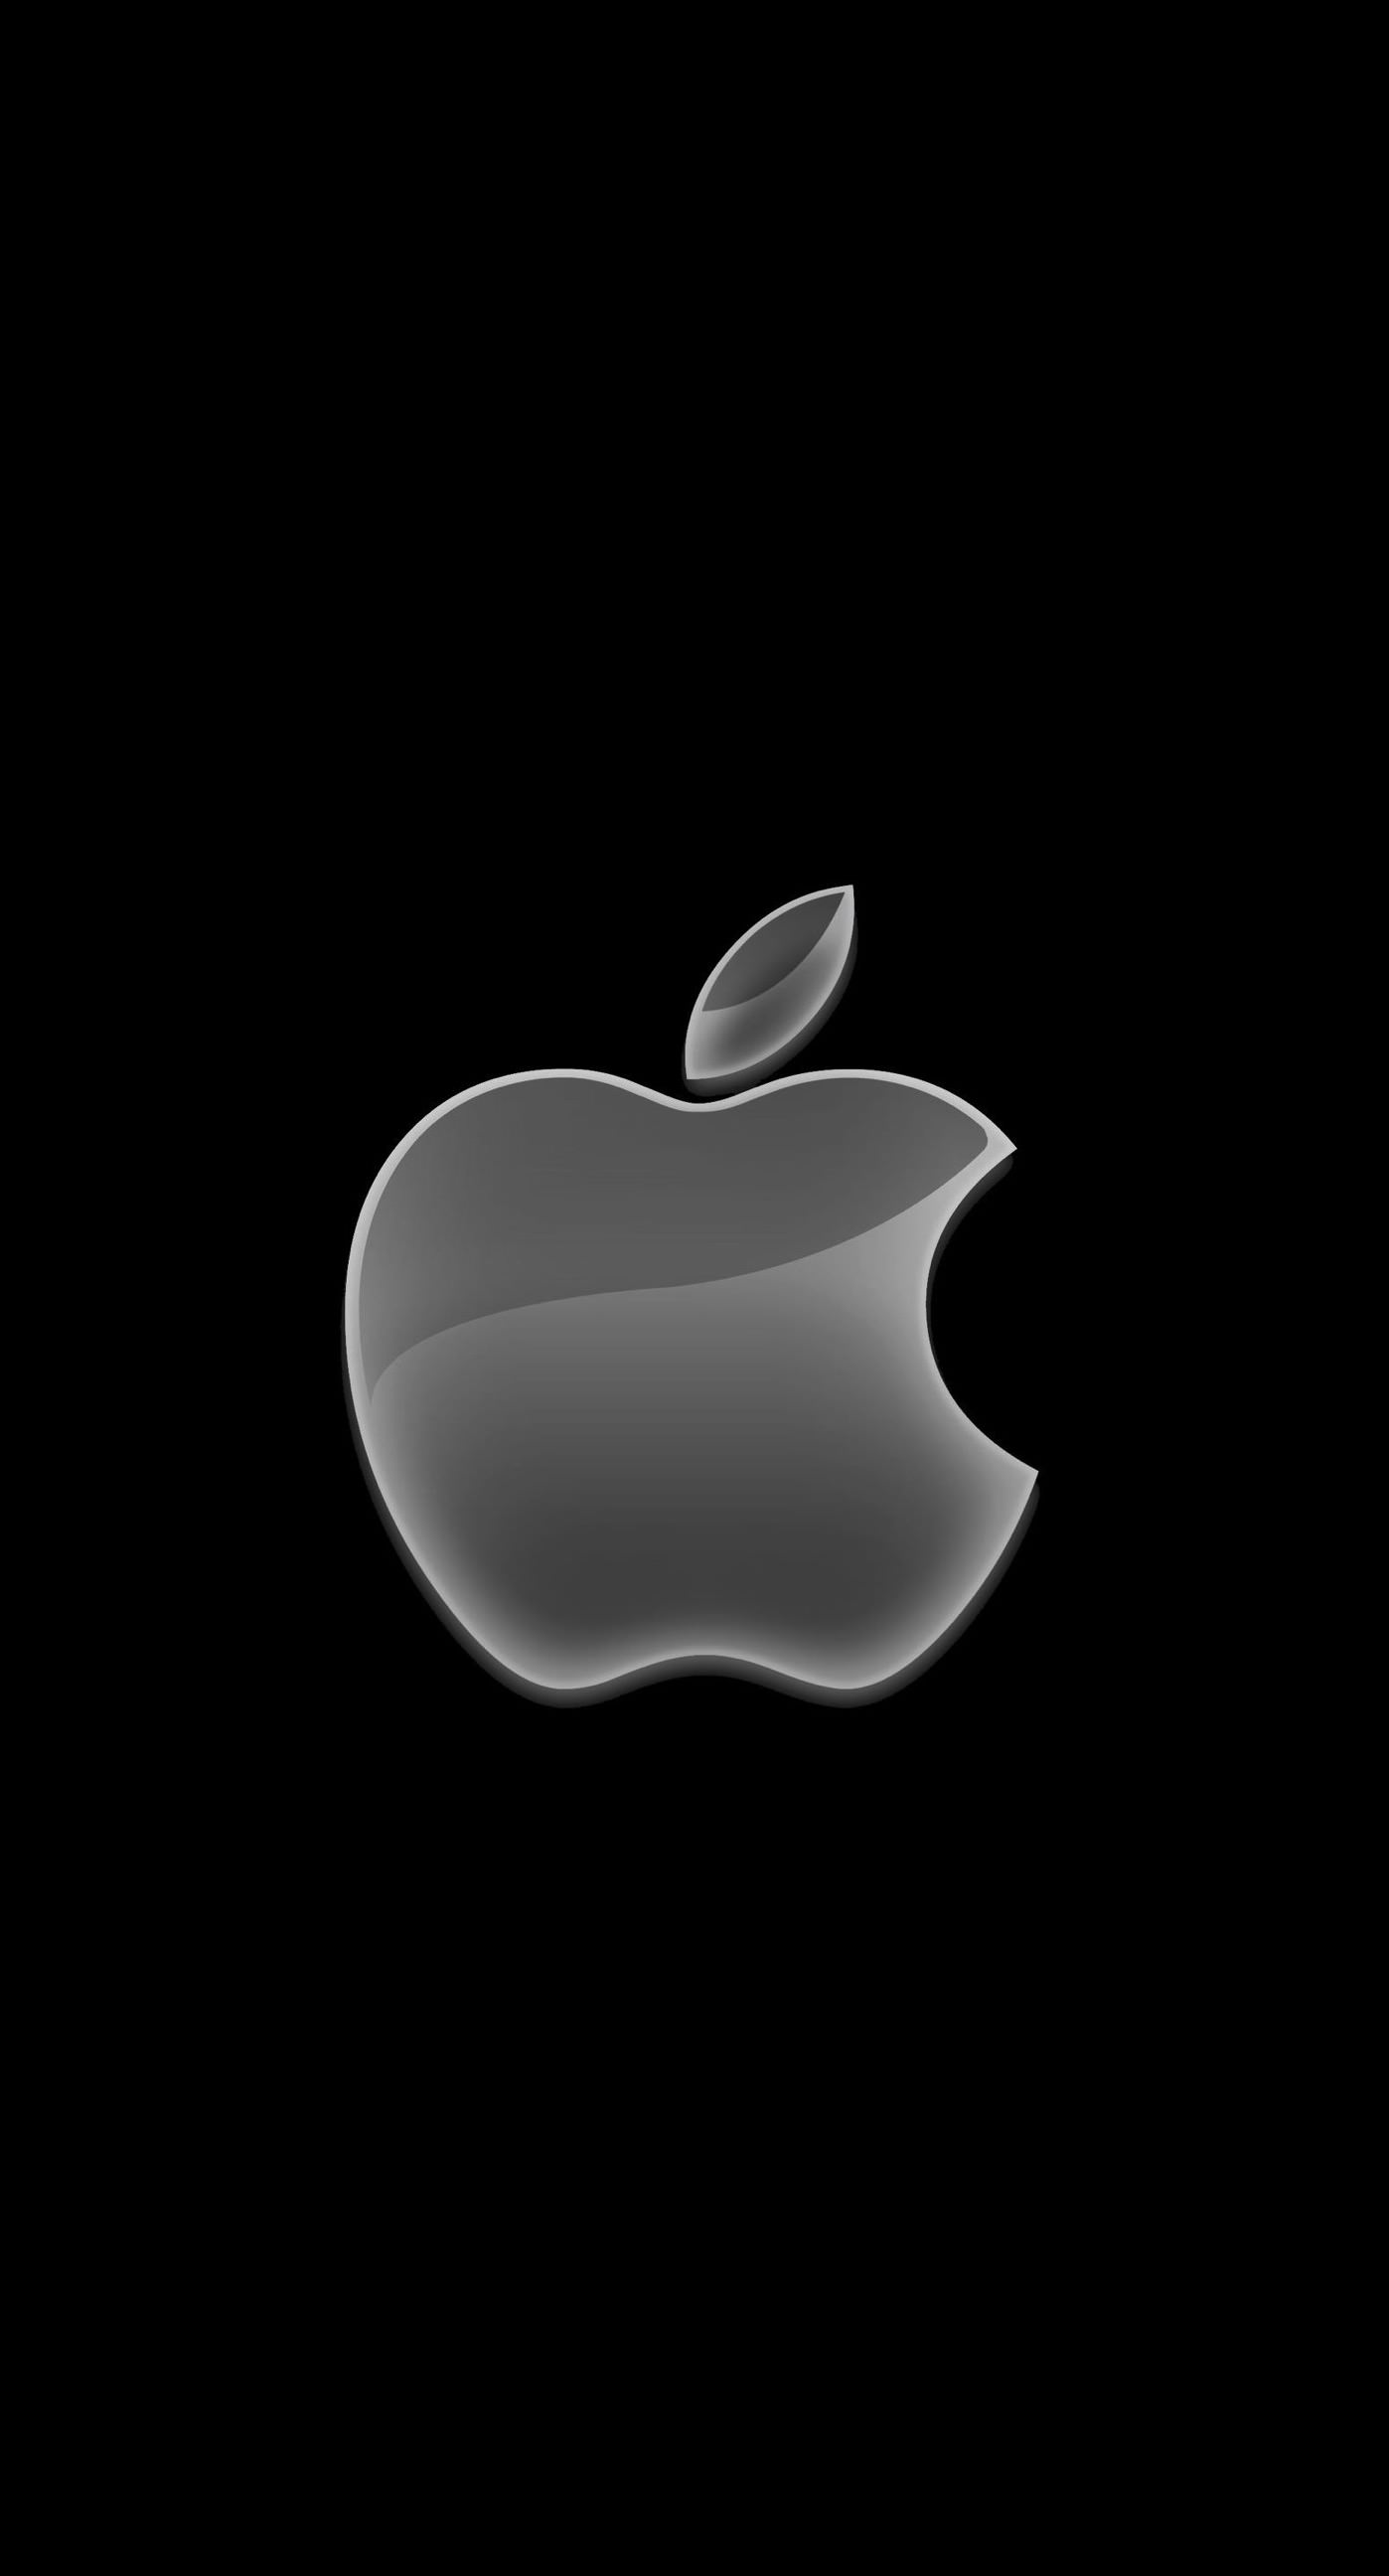 Appleロゴ黒クール Wallpaper Sc Iphone7plus壁紙